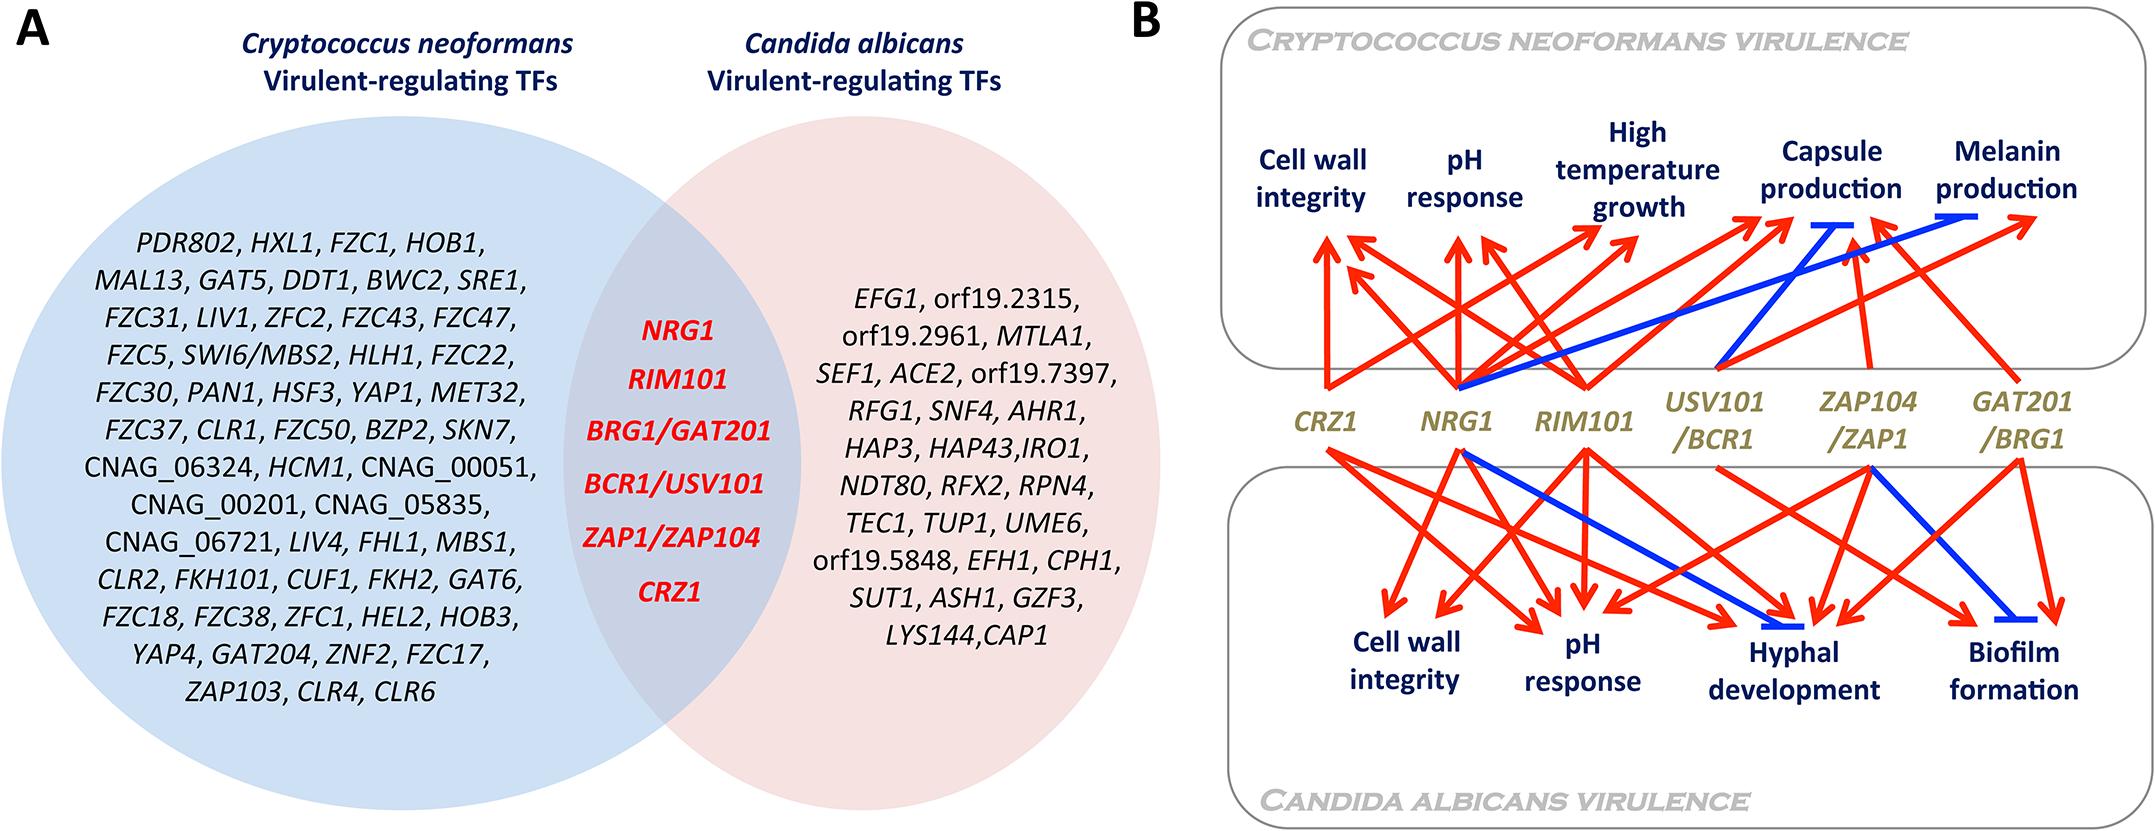 Virulence-regulating transcription factors in <i>Candida albicans</i> and <i>Cryptococcus neoformans</i>.